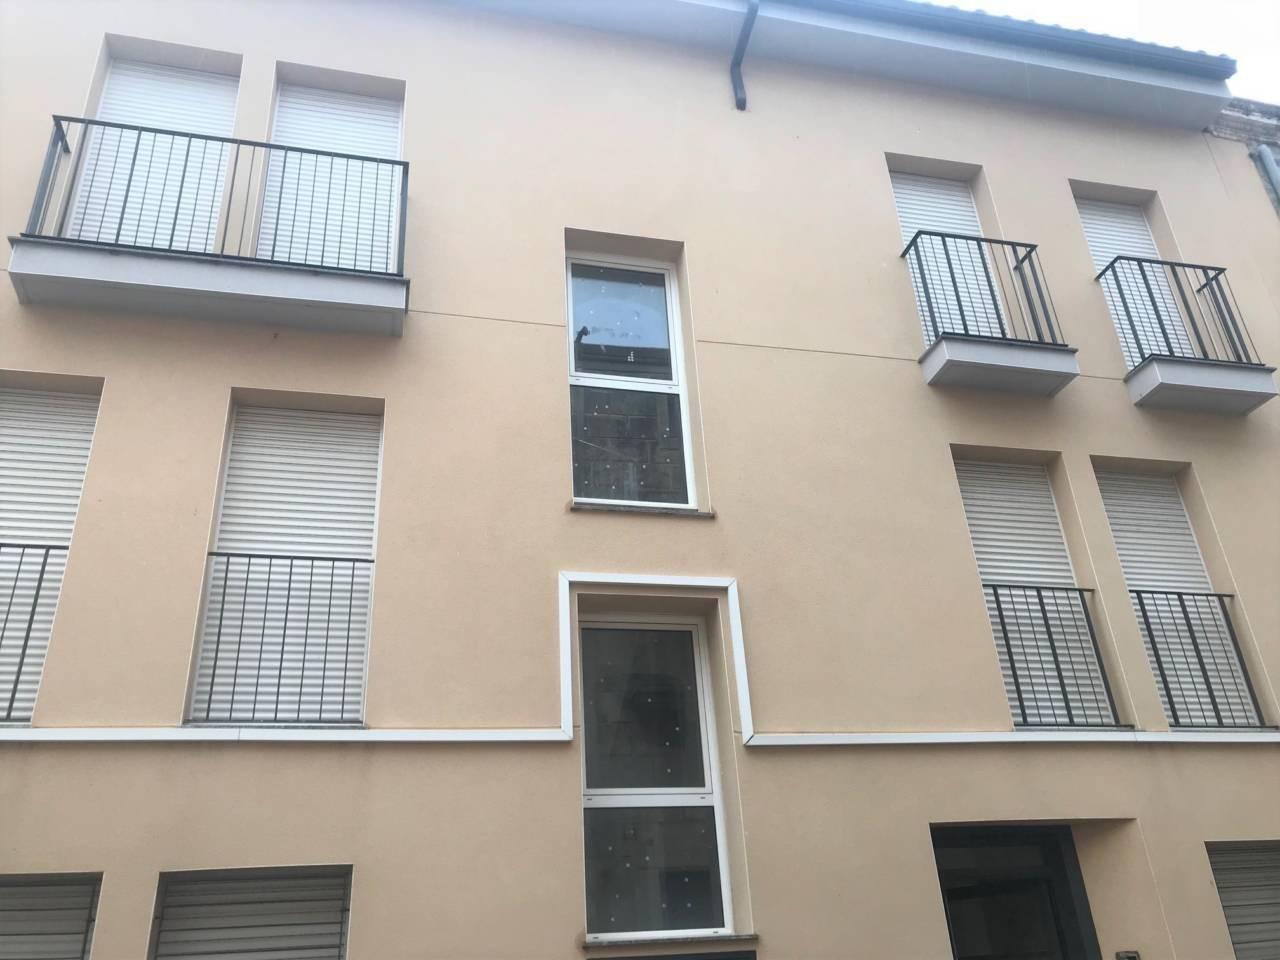 Piso  Calle major. Superf. 107 m²,  3 habitaciones,  1 baño, terraza, ascensor.